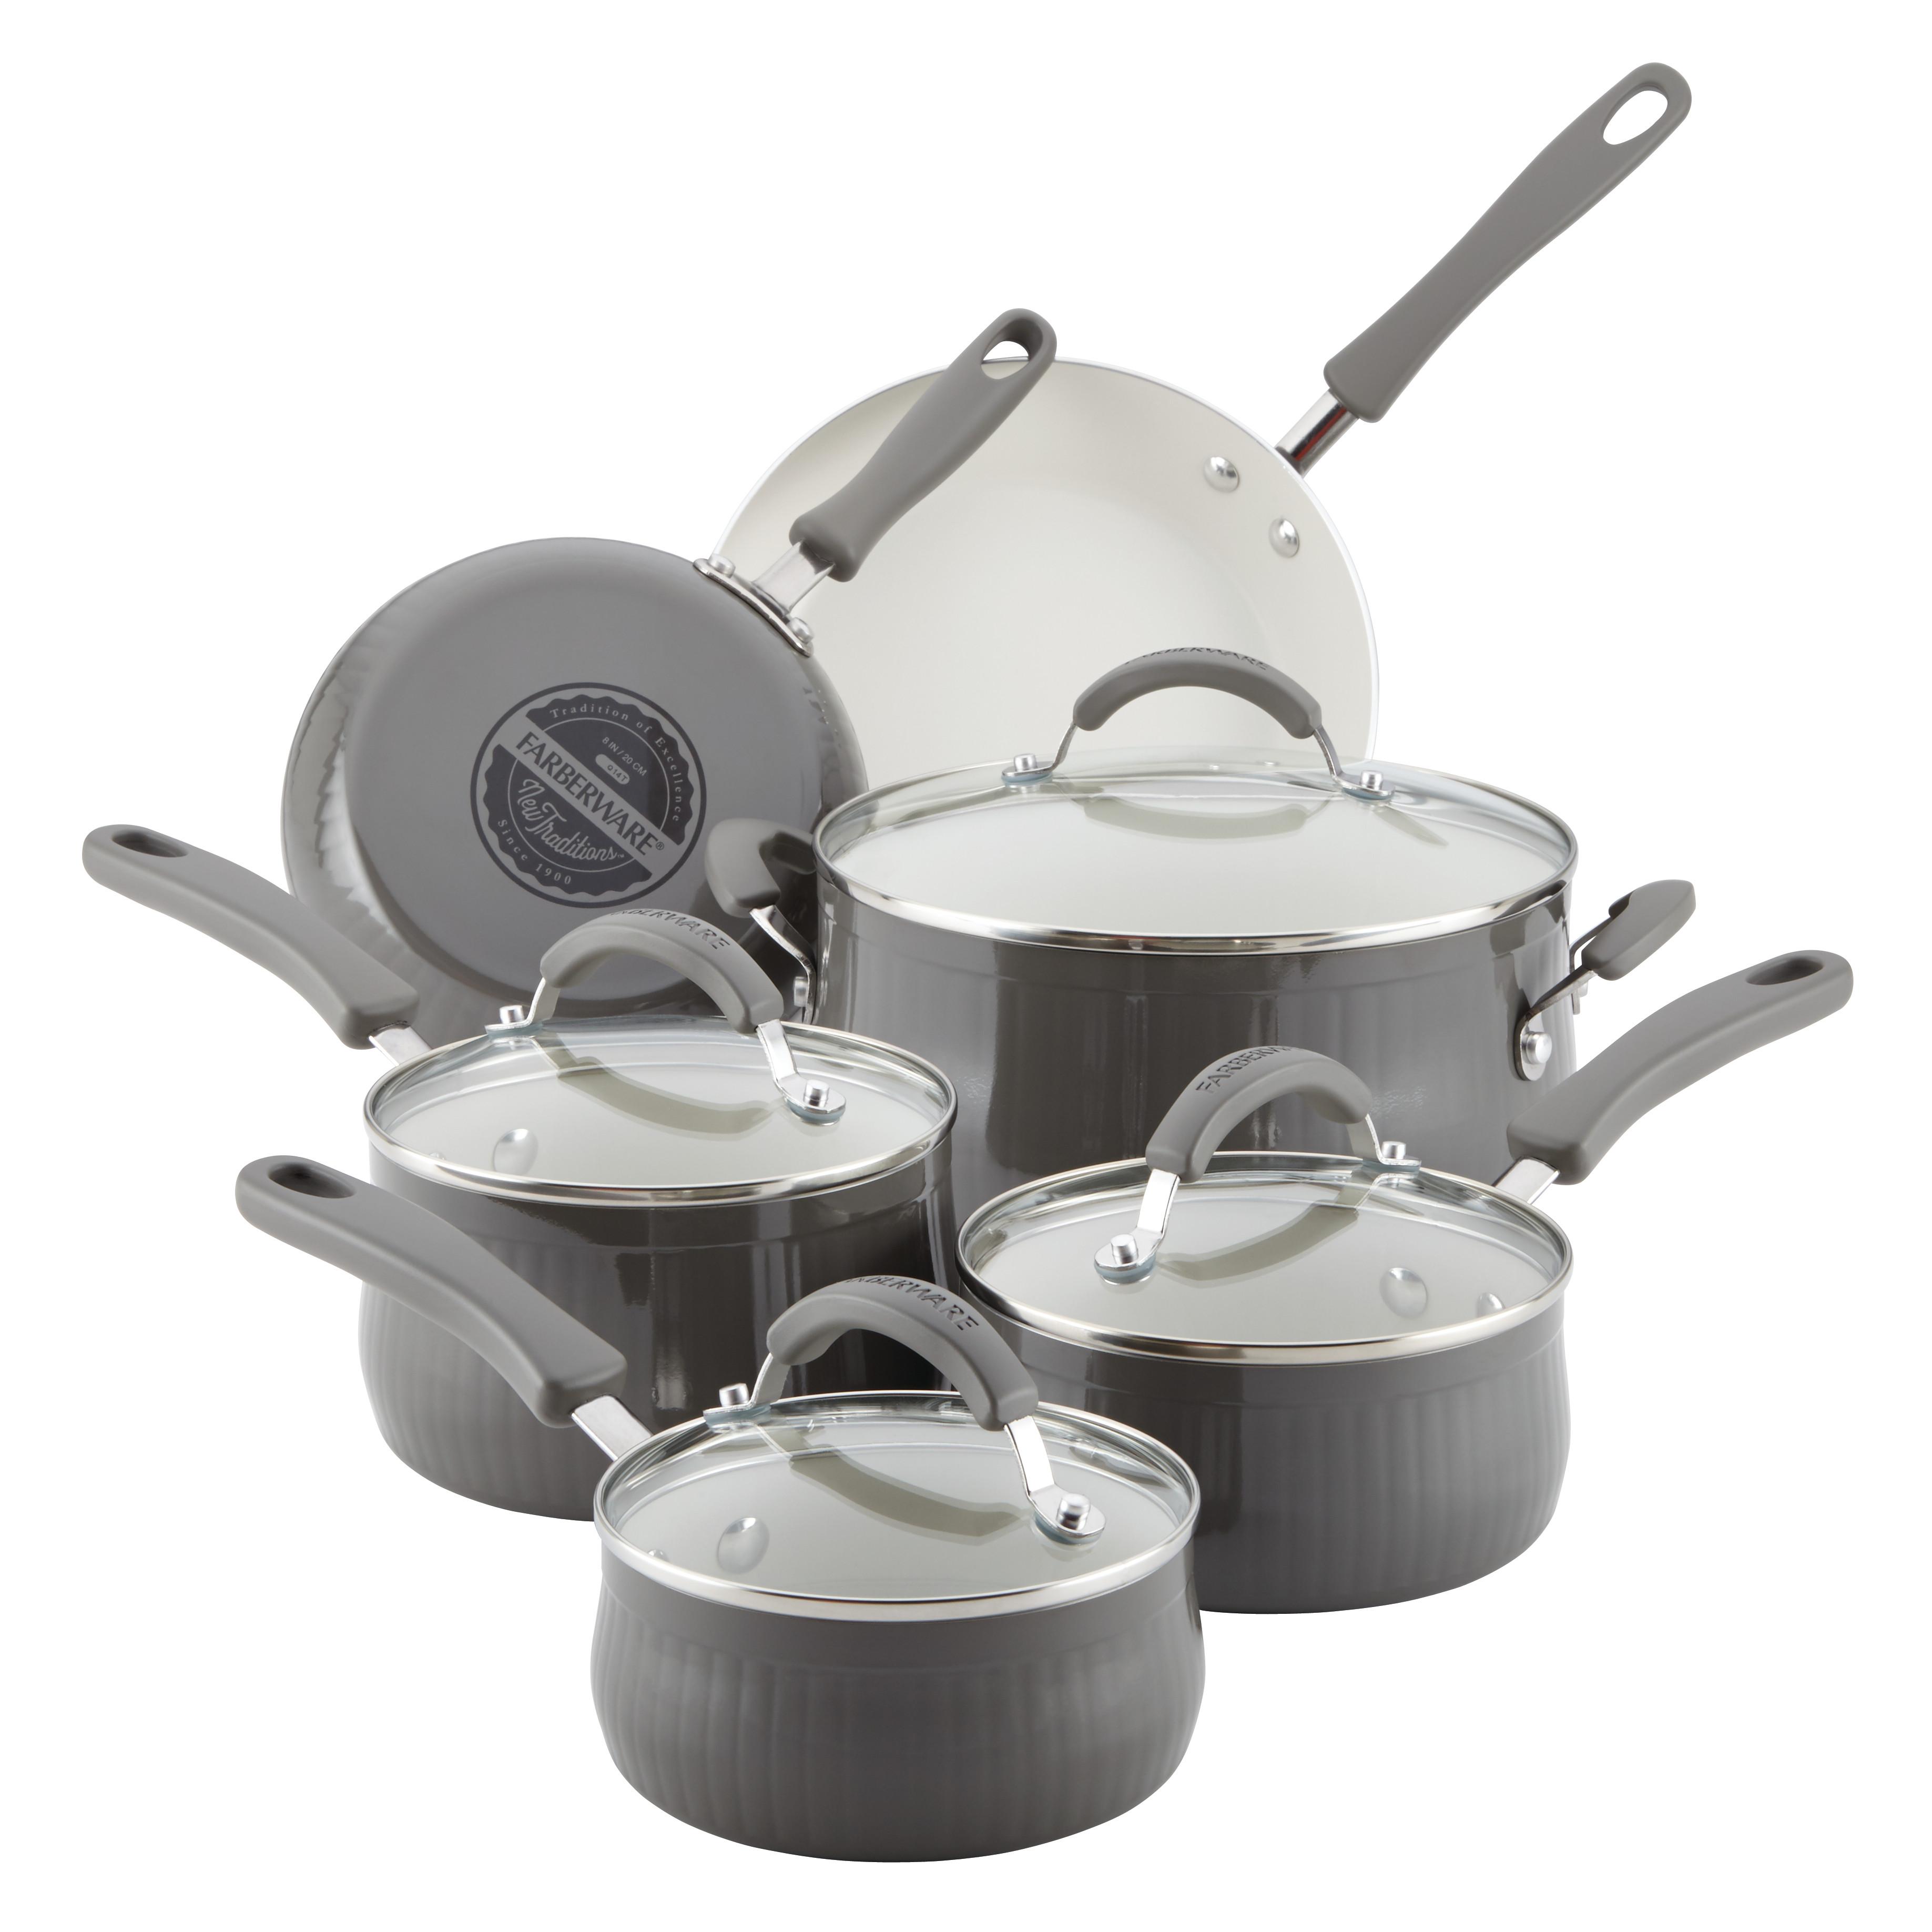 Farberware New Traditions Aluminum Nonstick 10-Piece Cookware Set, Gray